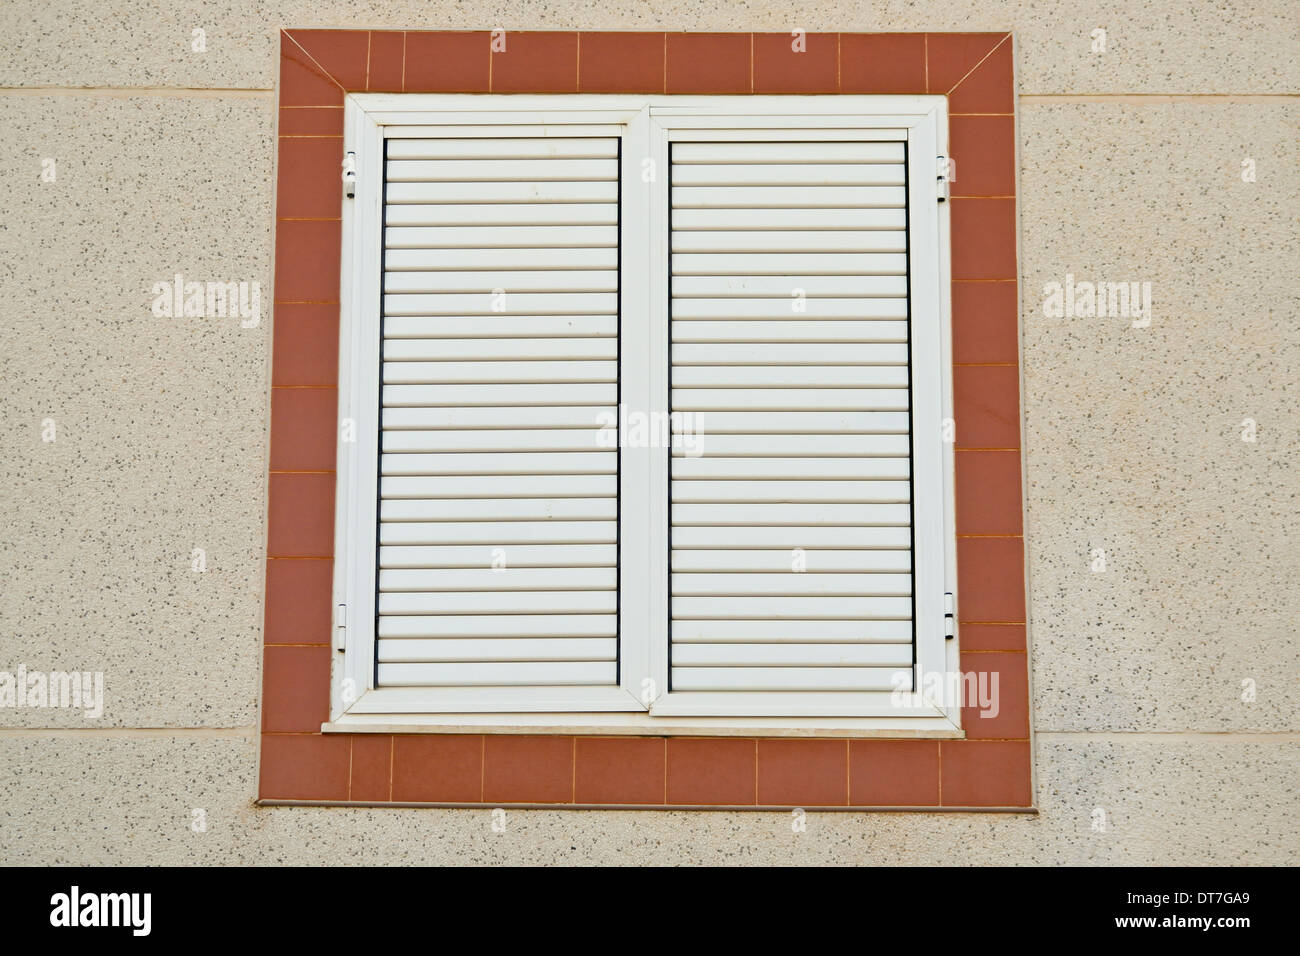 Black Window Surround Stockfotos & Black Window Surround Bilder - Alamy